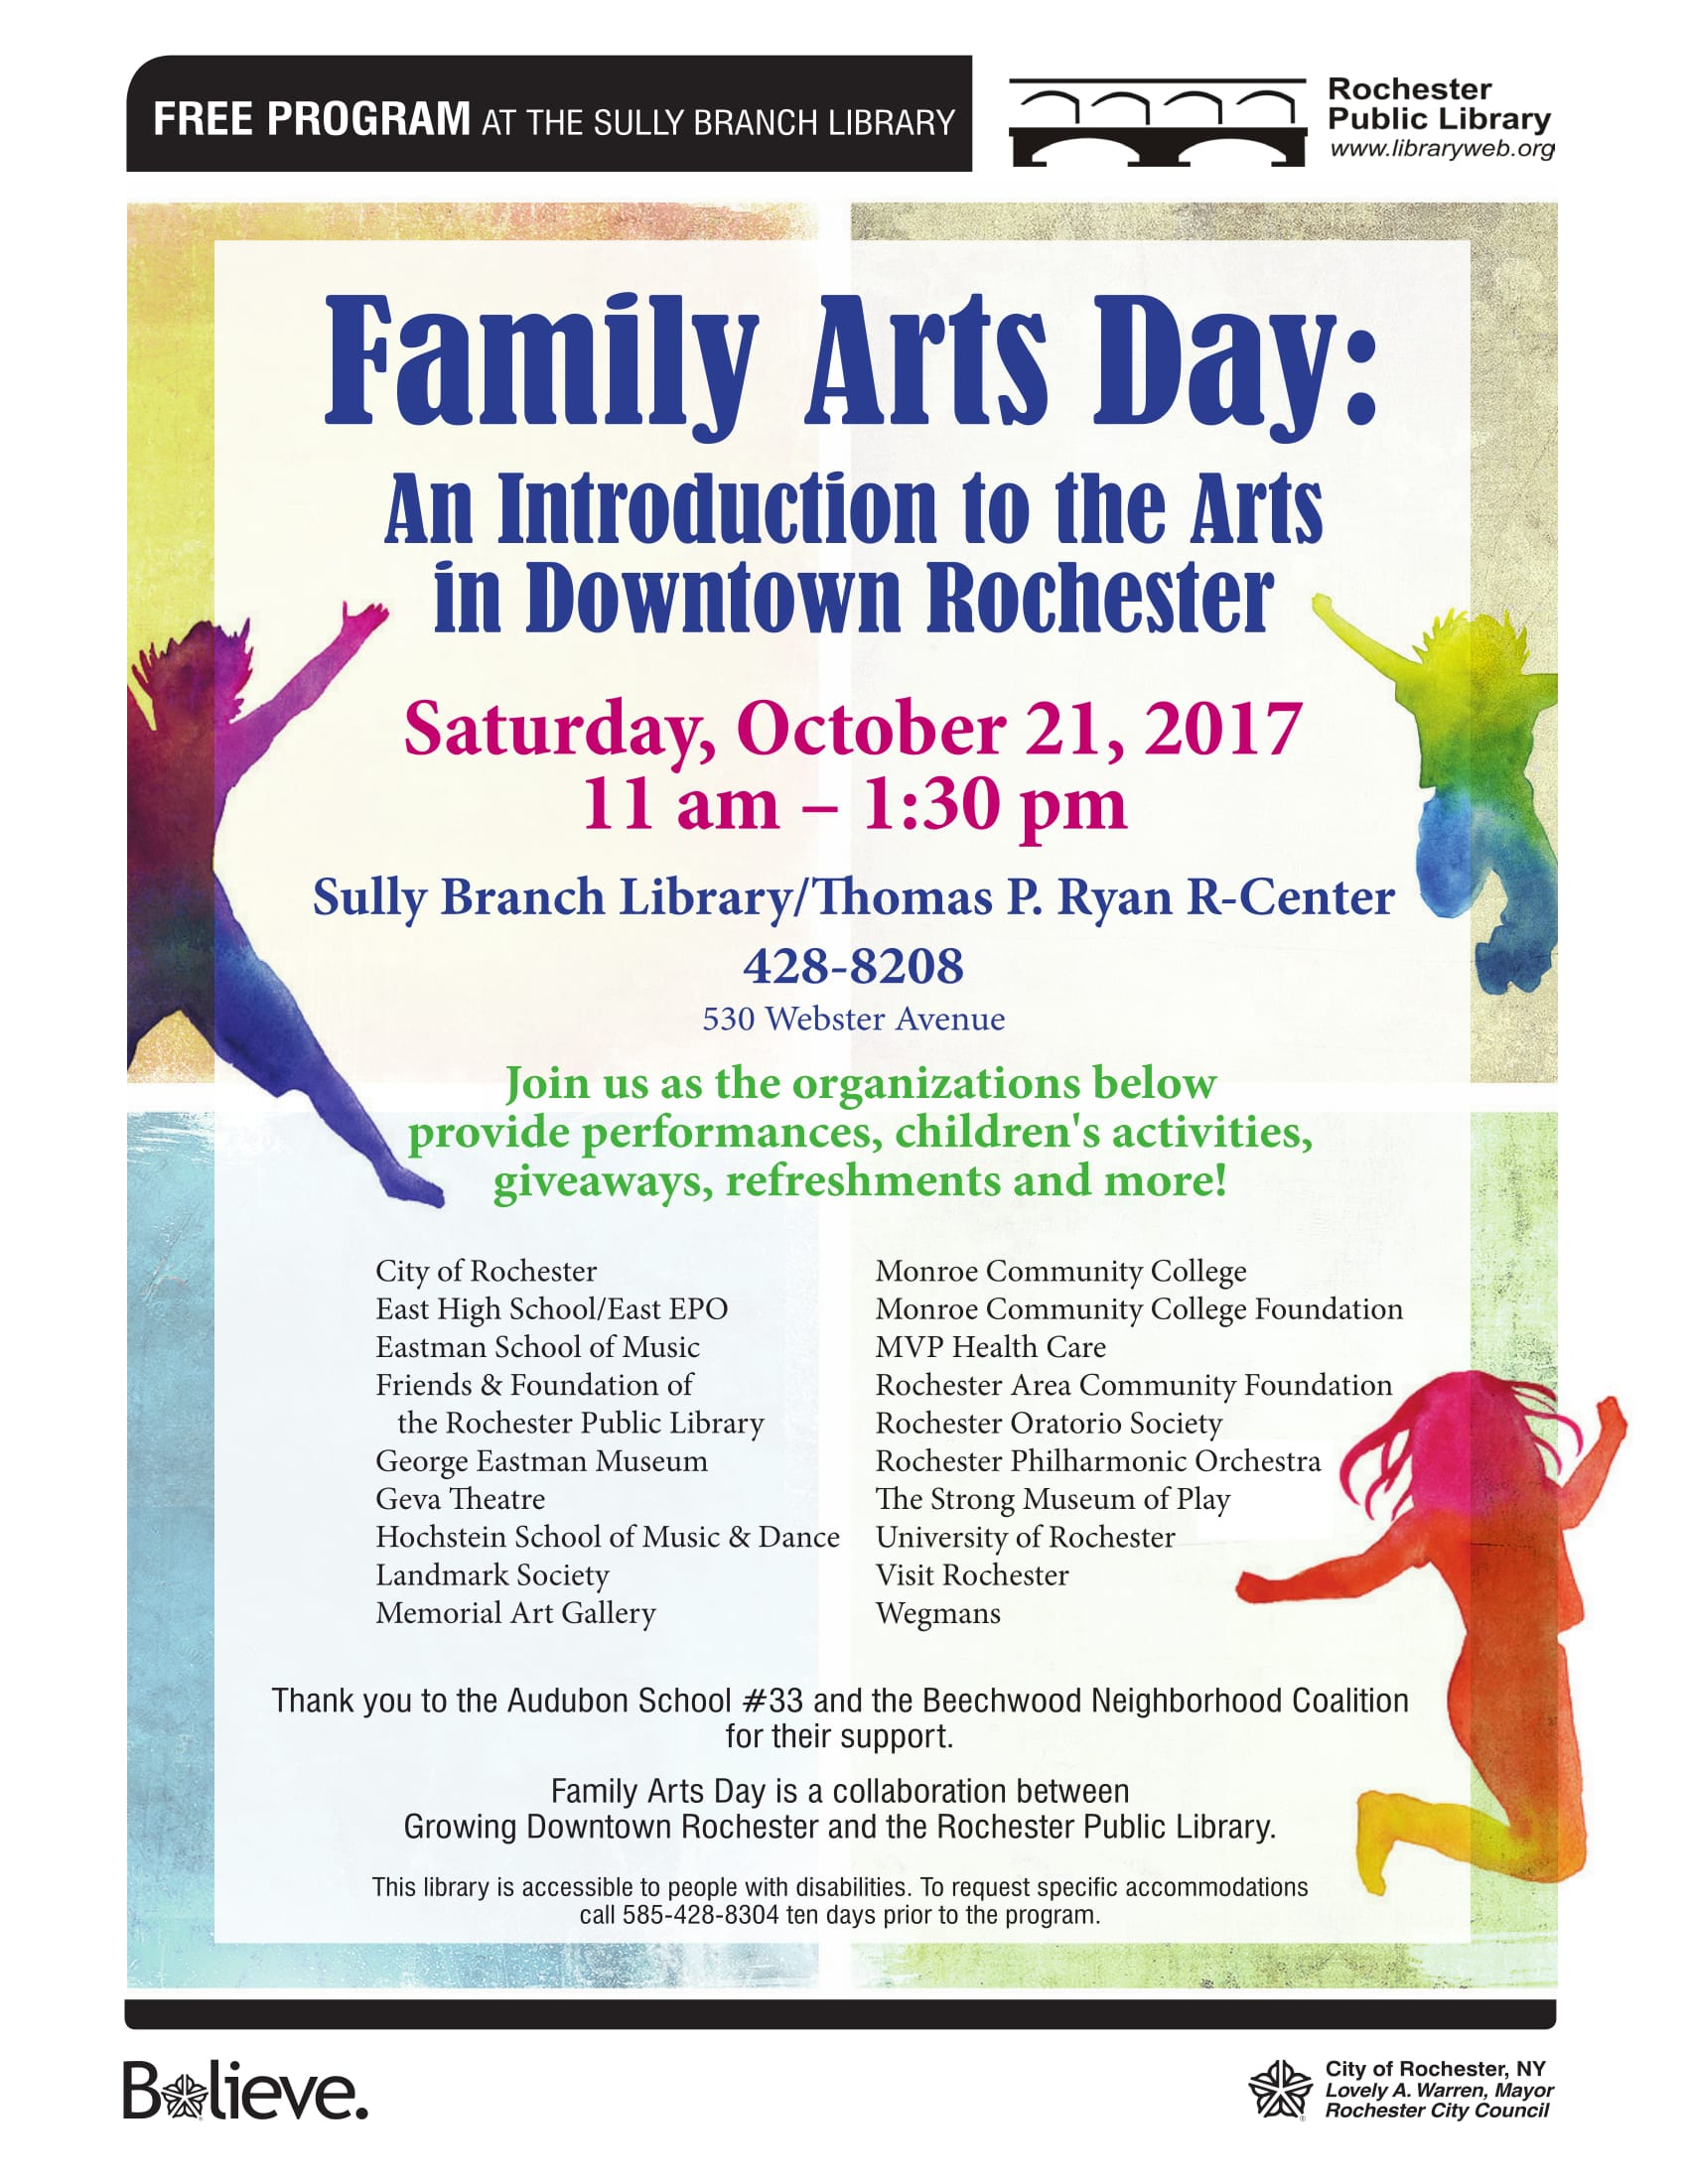 Family Arts Day 8x11-1.jpg